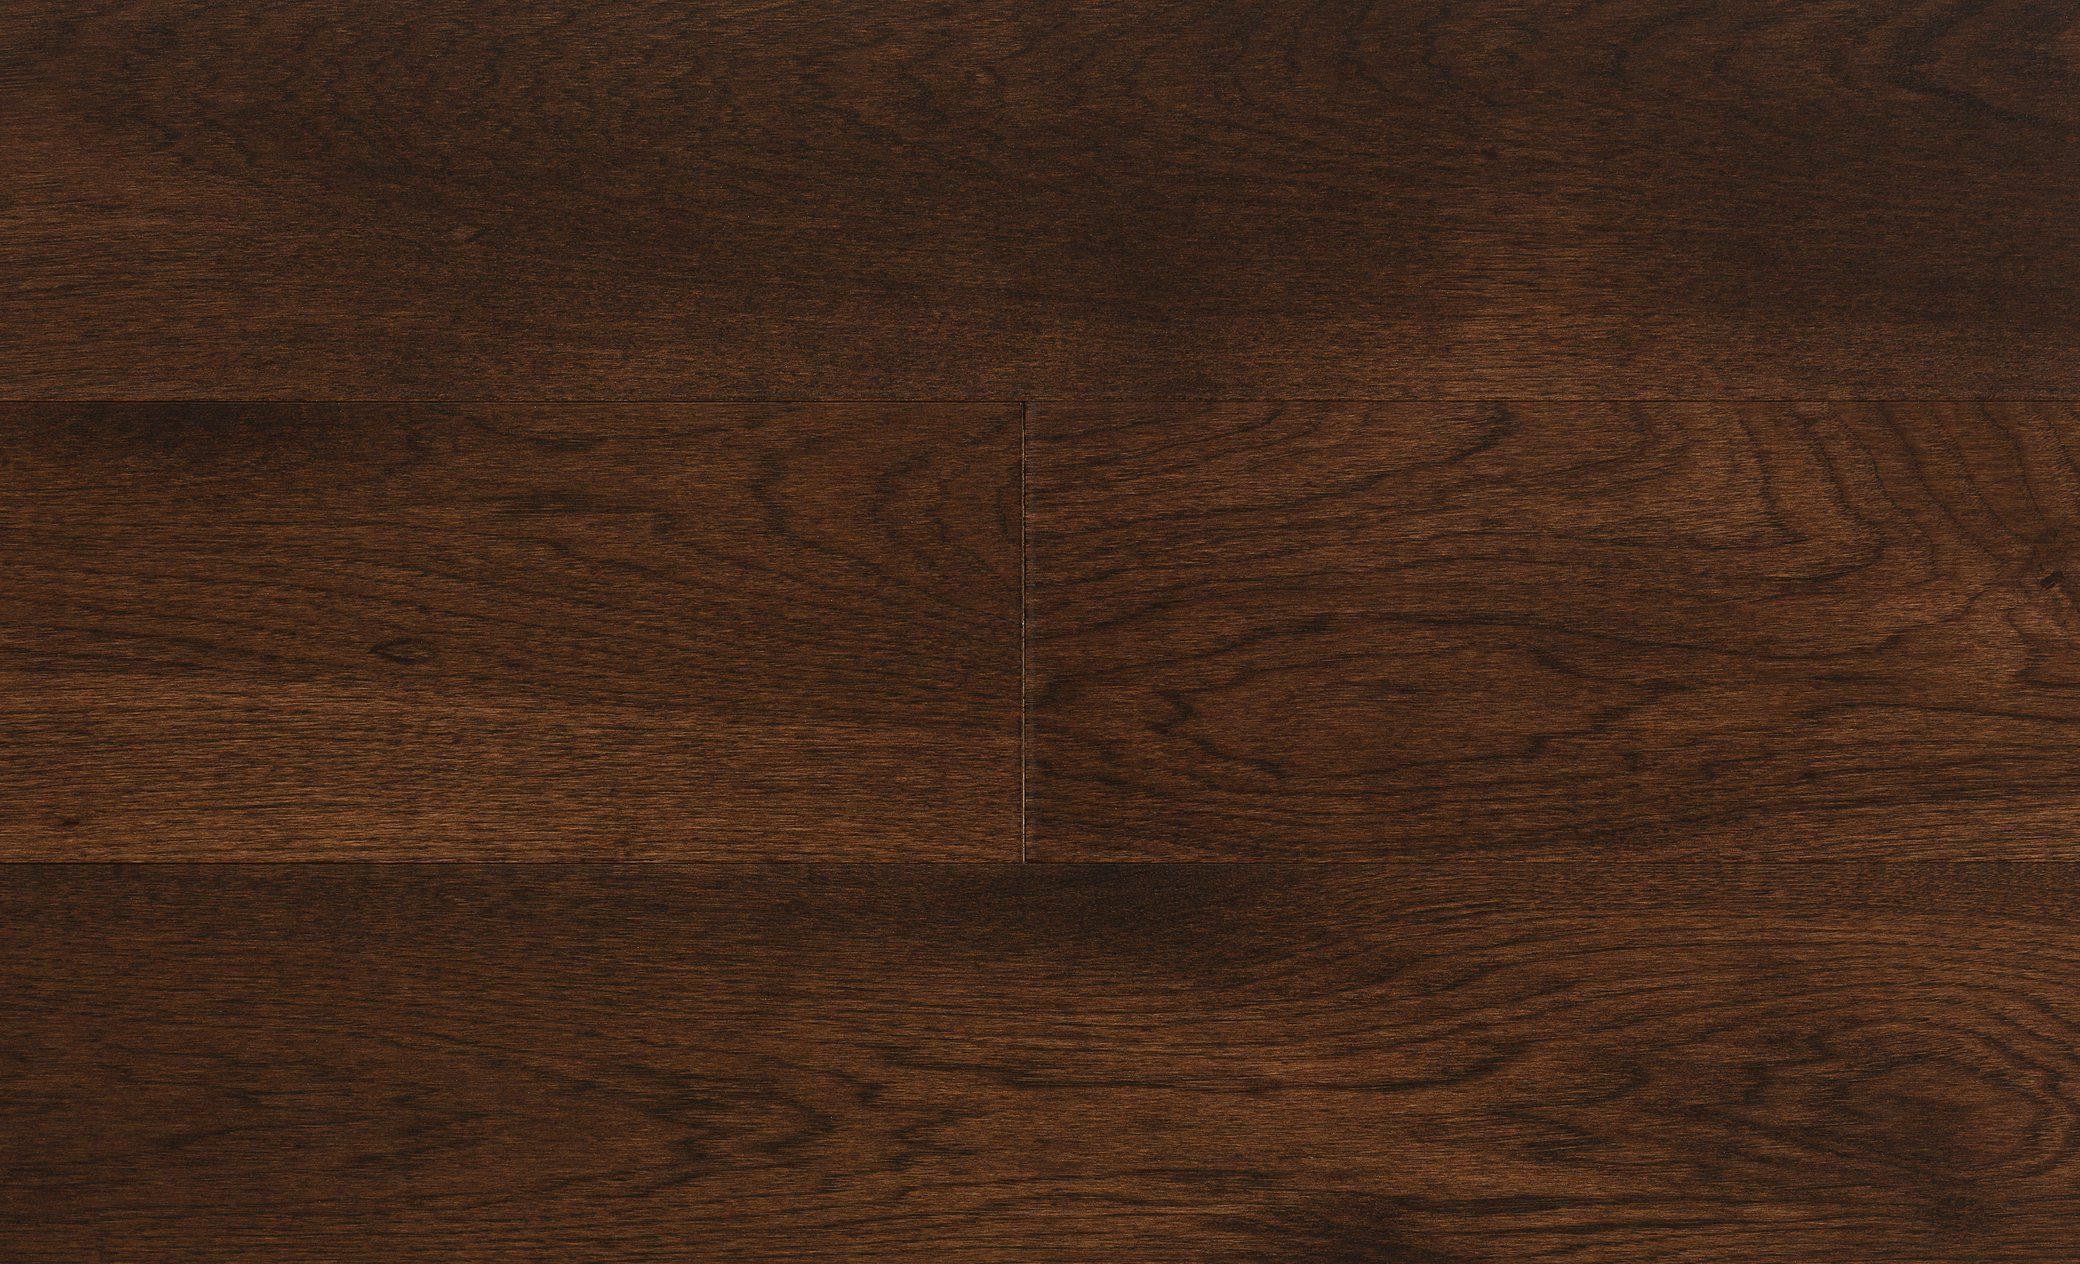 Mercier Elegancia Black Cherry Hickory Engineered Width: 3 1/4